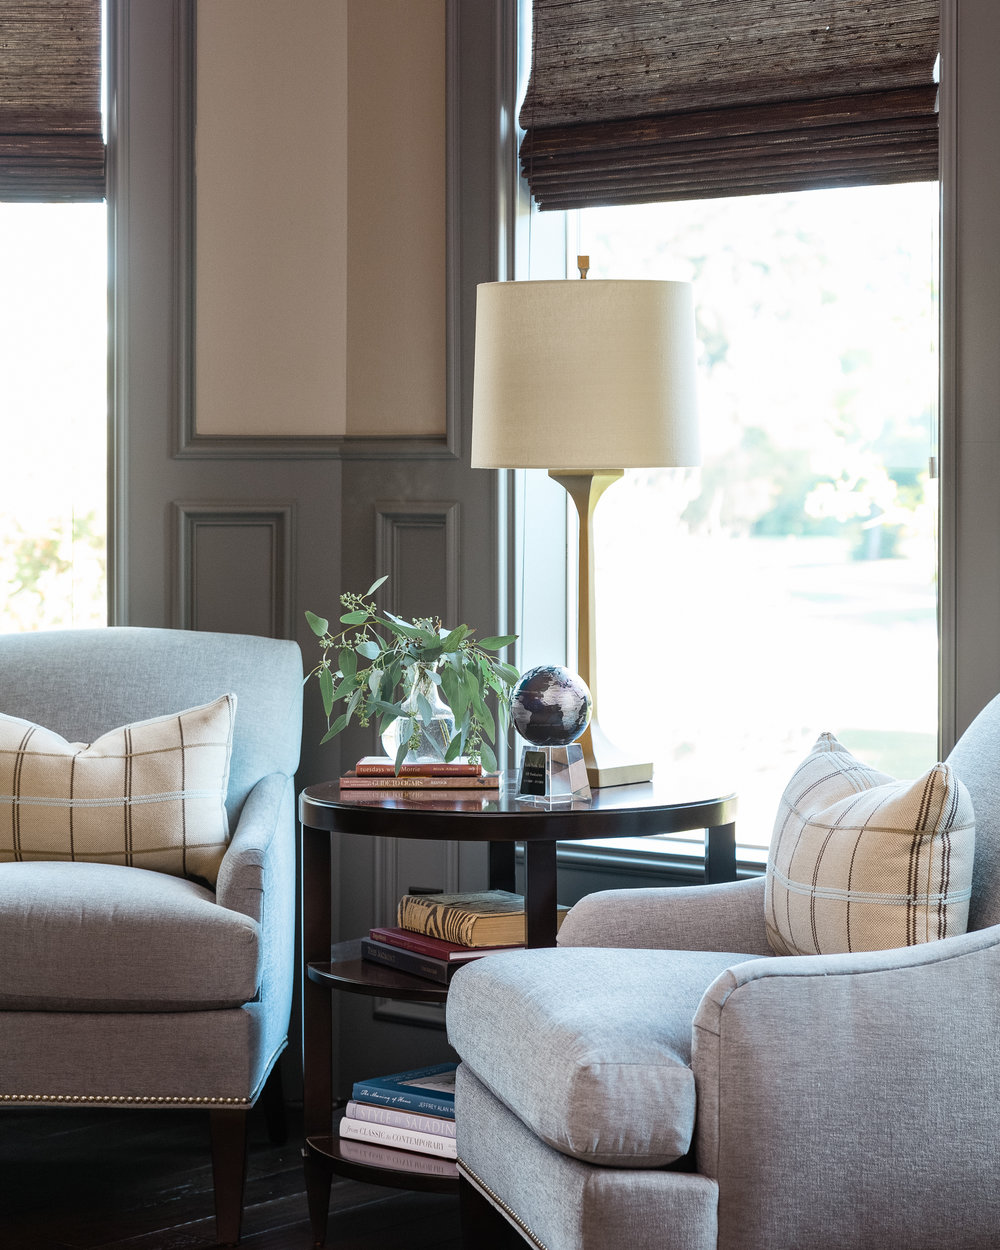 Home Office Seating | Carla Aston - Designer, Shaun Bain - Contractor, Colleen Scott - Photographer #study #homeoffice #paneling #homedecorideas #decorating